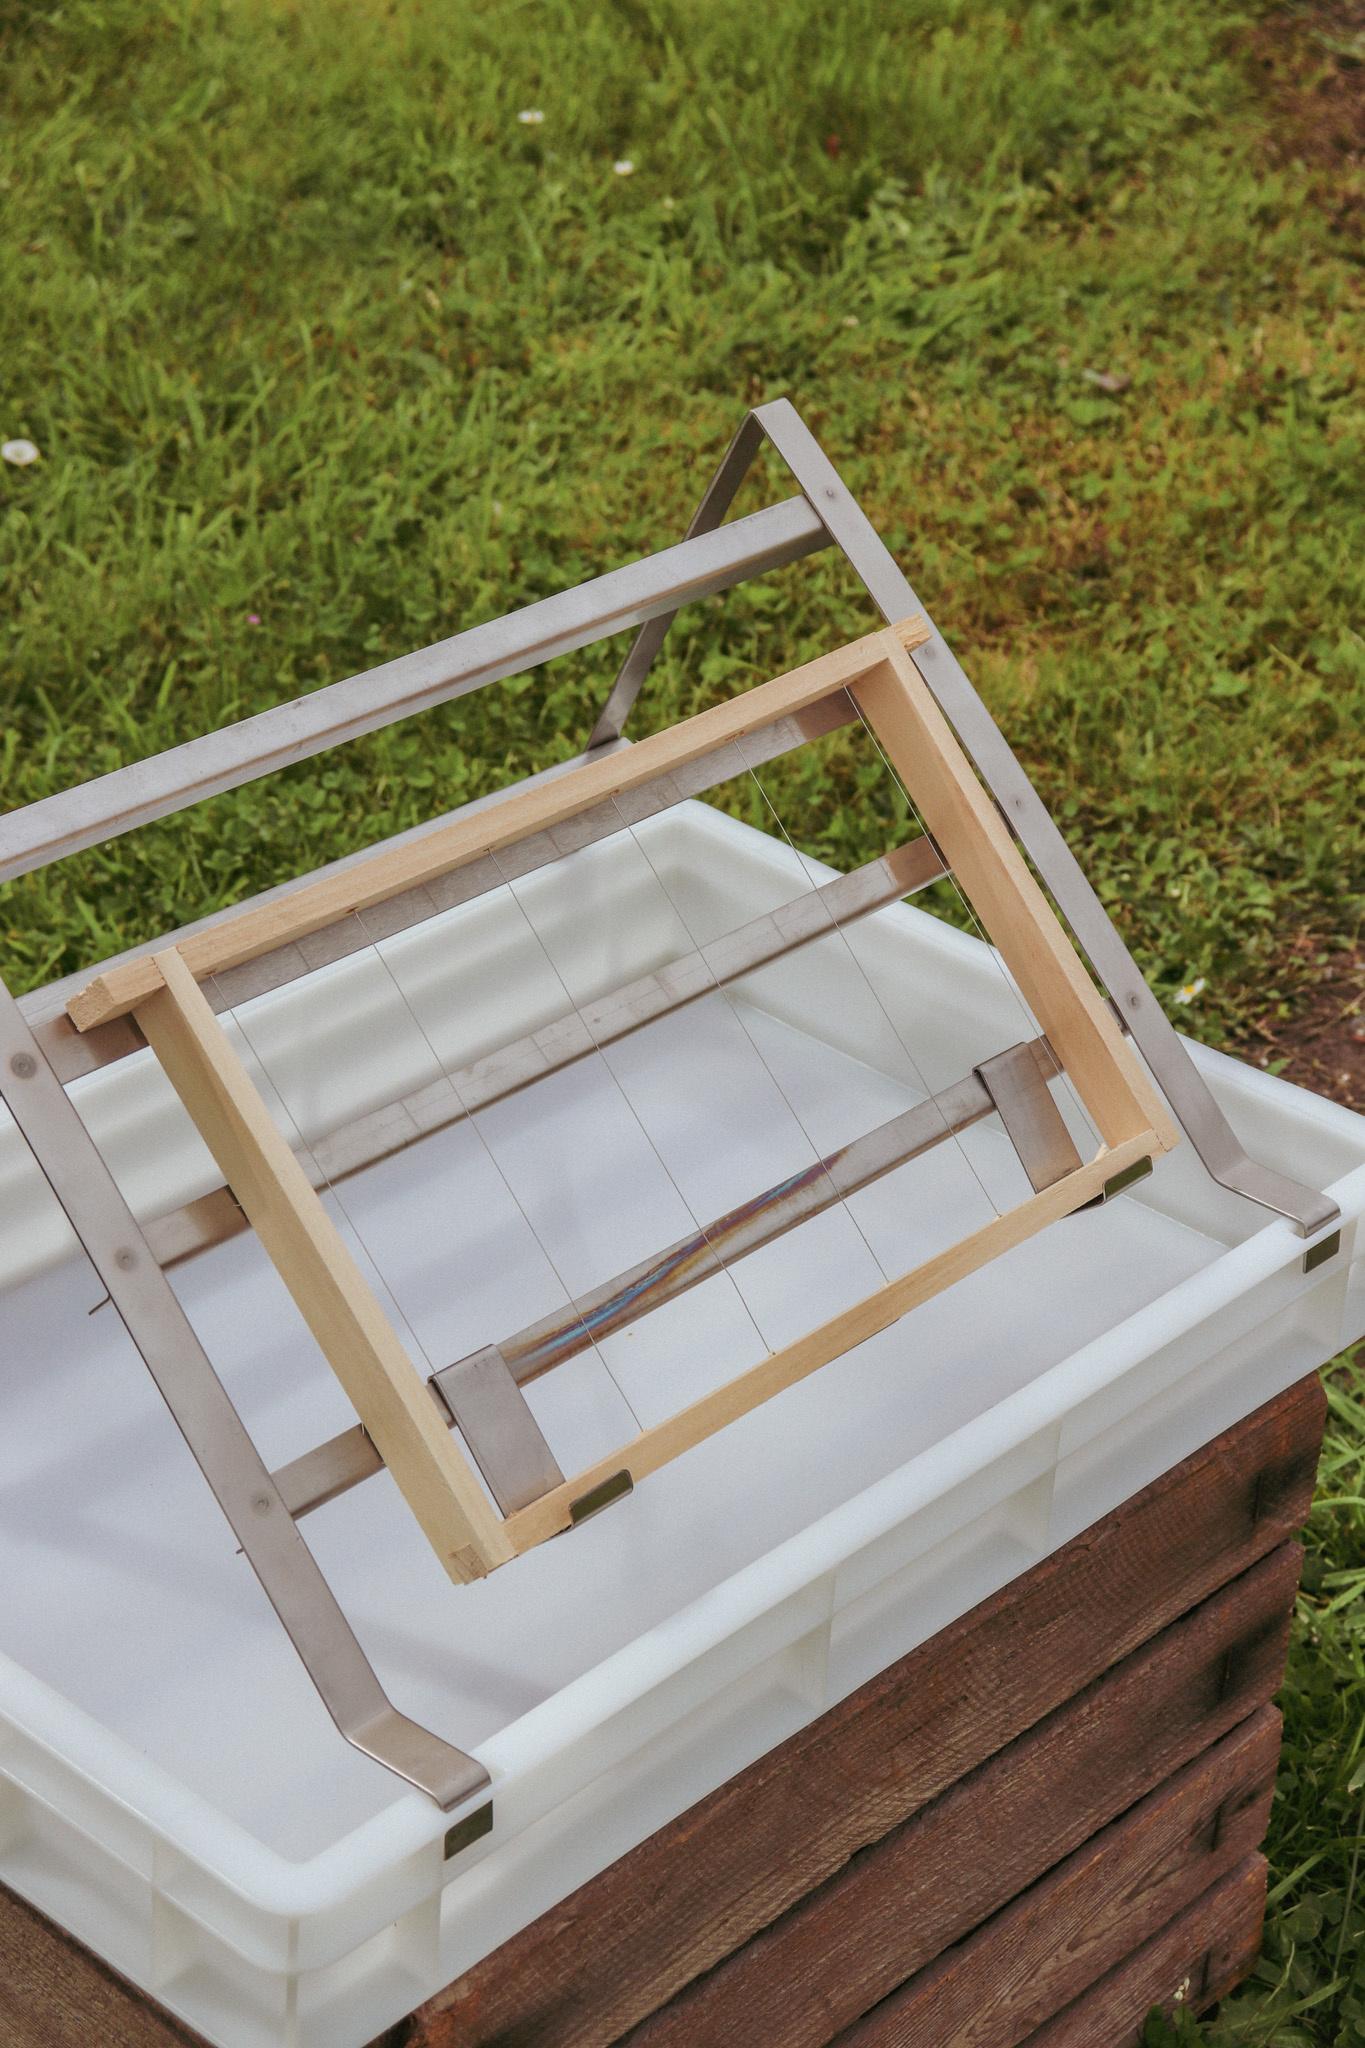 Starterspakket 'honingoogst tot 10 bijenkasten'-5